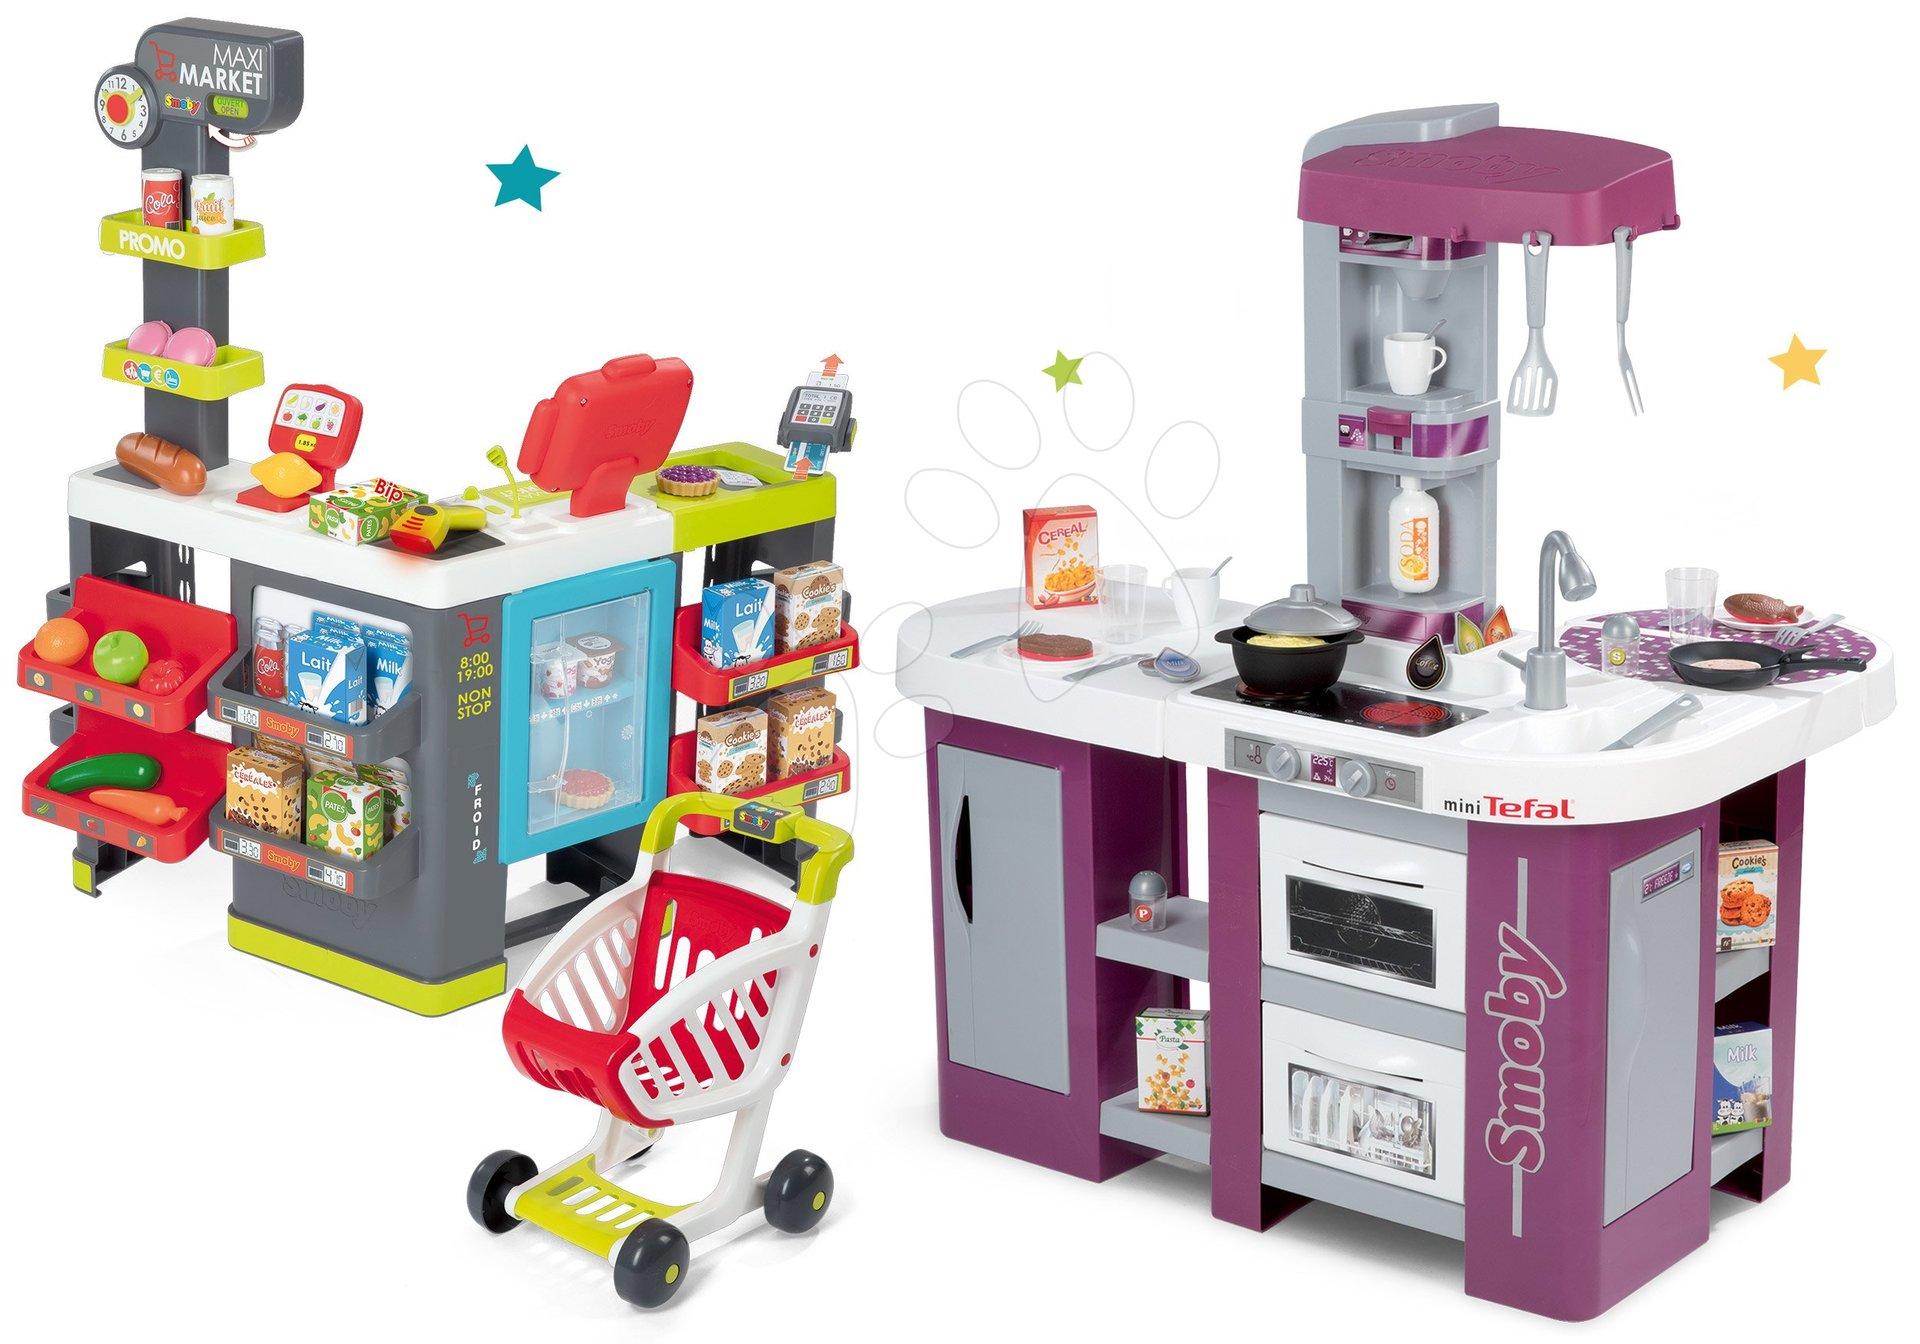 Set kuchynka fialová Tefal Studio XL Smoby elektronická s umývačkou riadu a obchod zmiešaný tovar Maxi Market